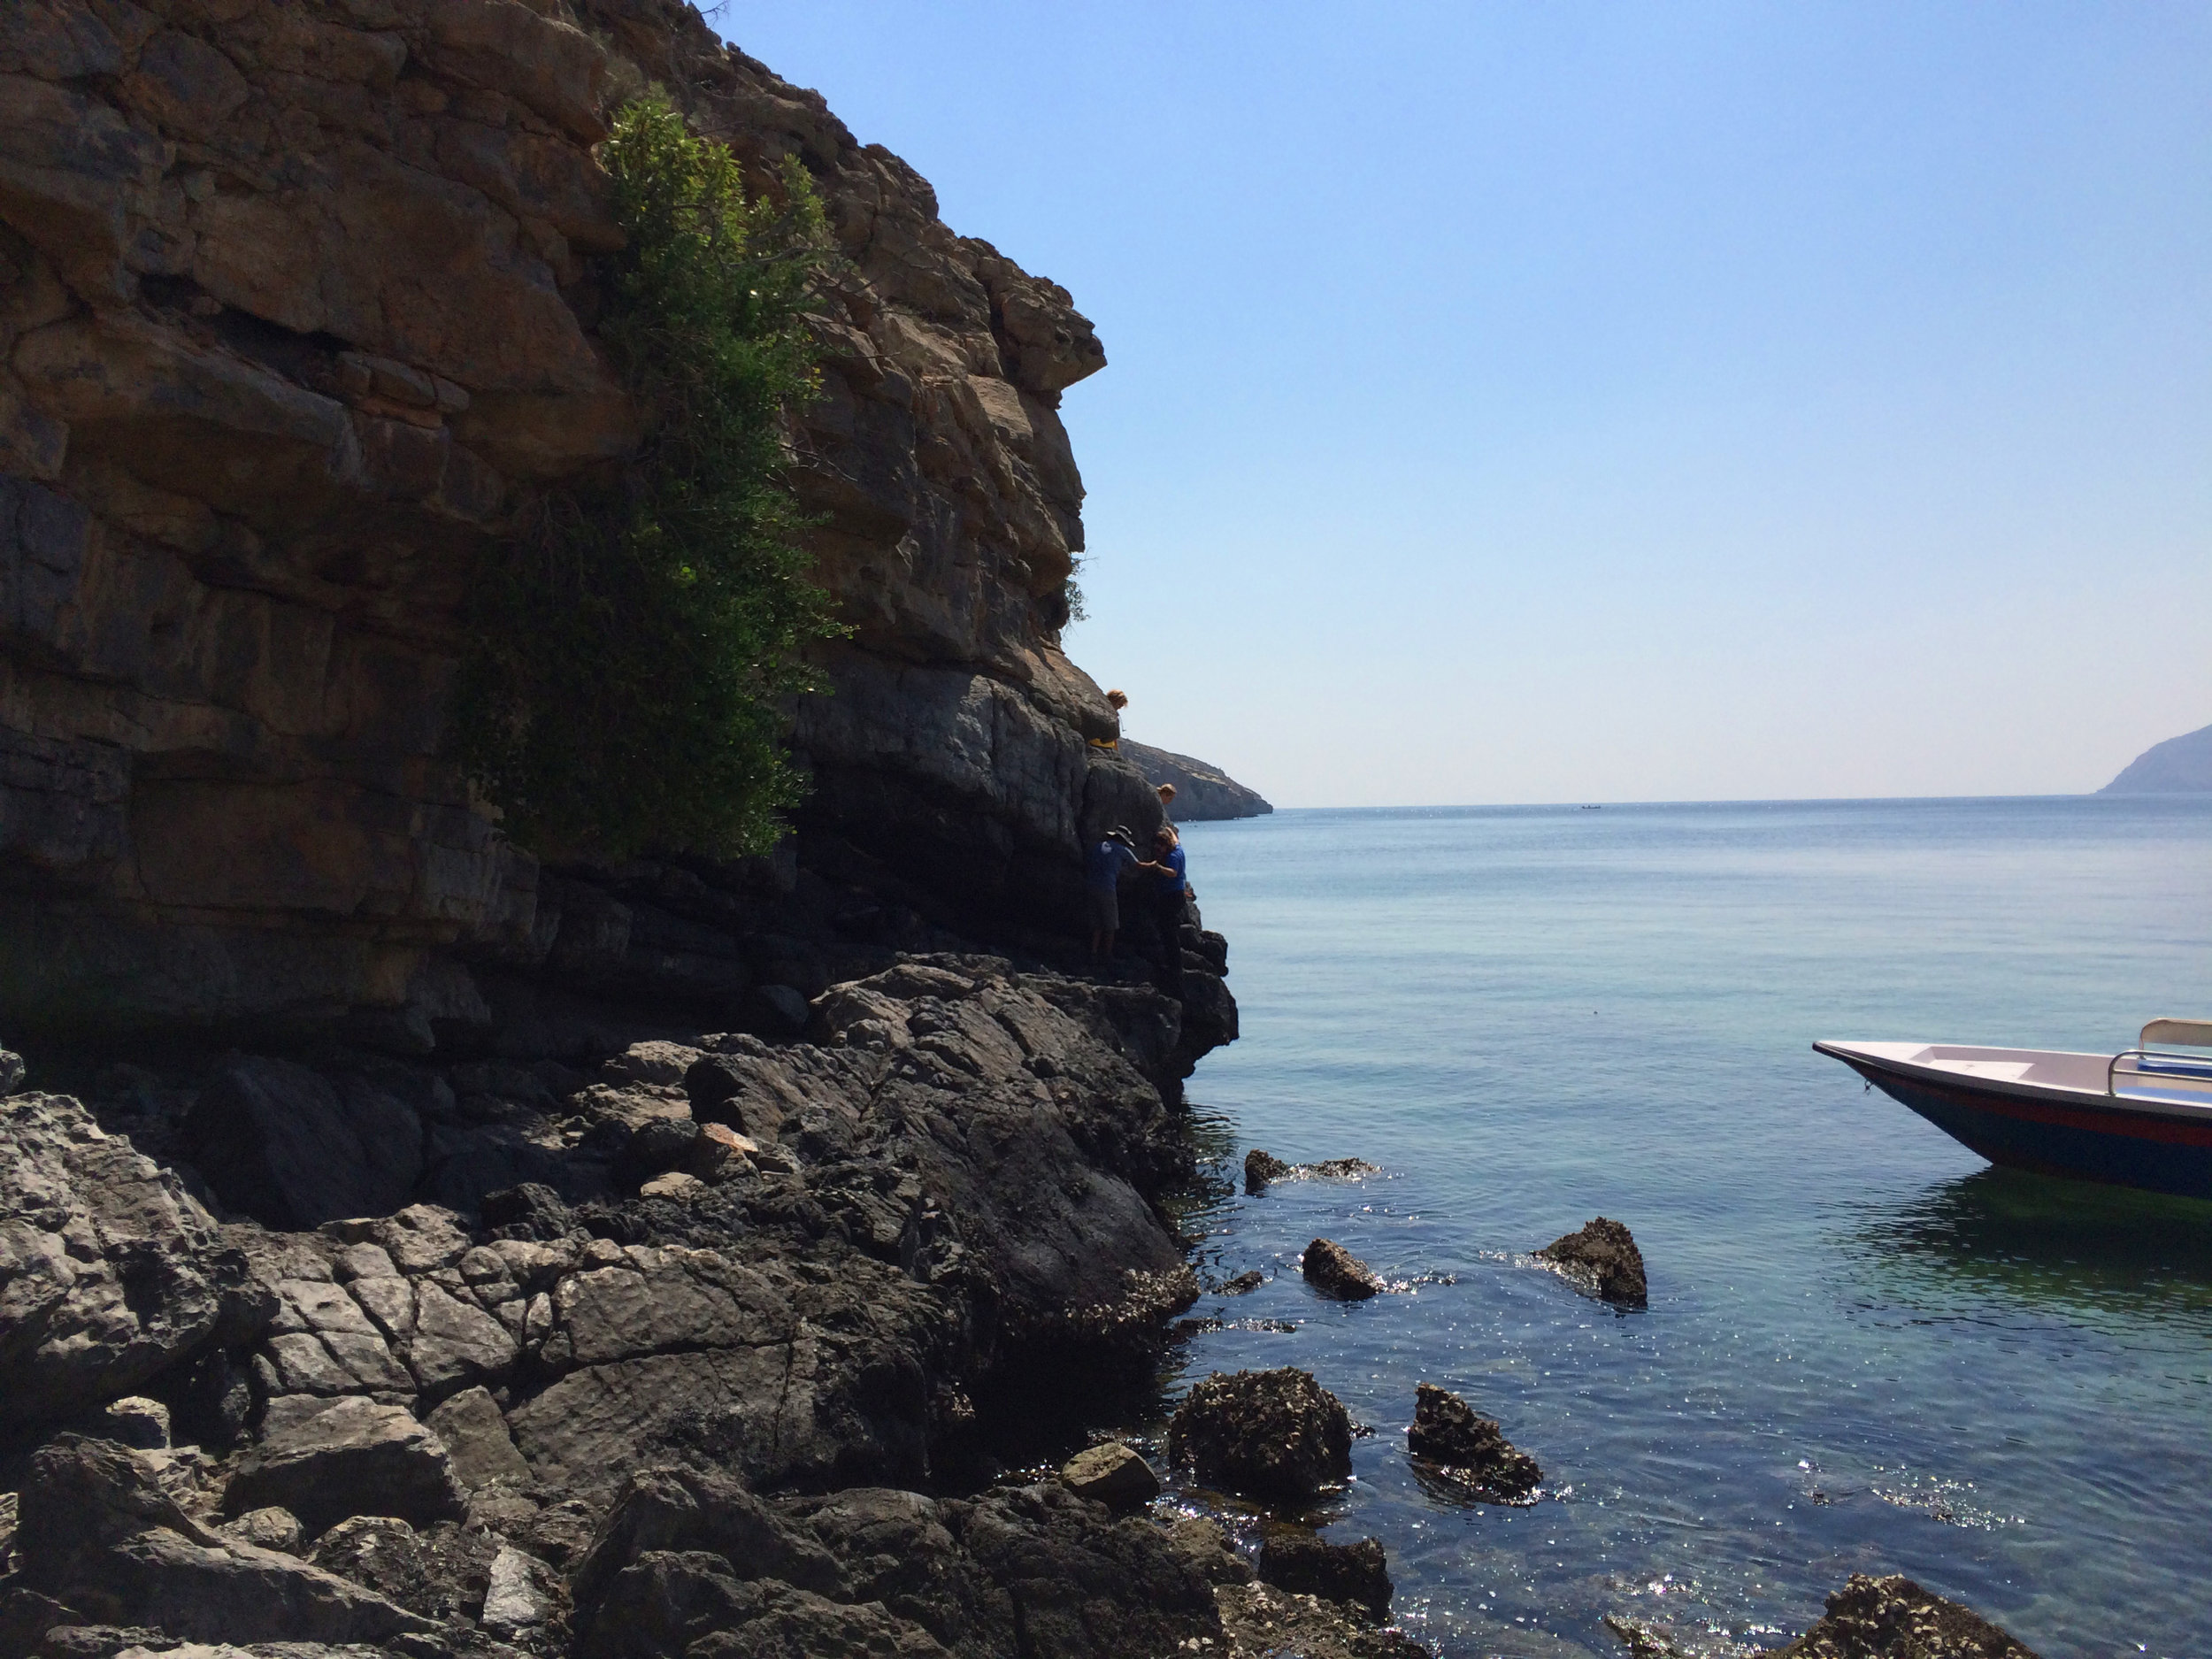 The scenic boat ride on the Aqaba-Lima trek in Oman with Absolute Adventure, cruising around the  Musandam Peninsula.